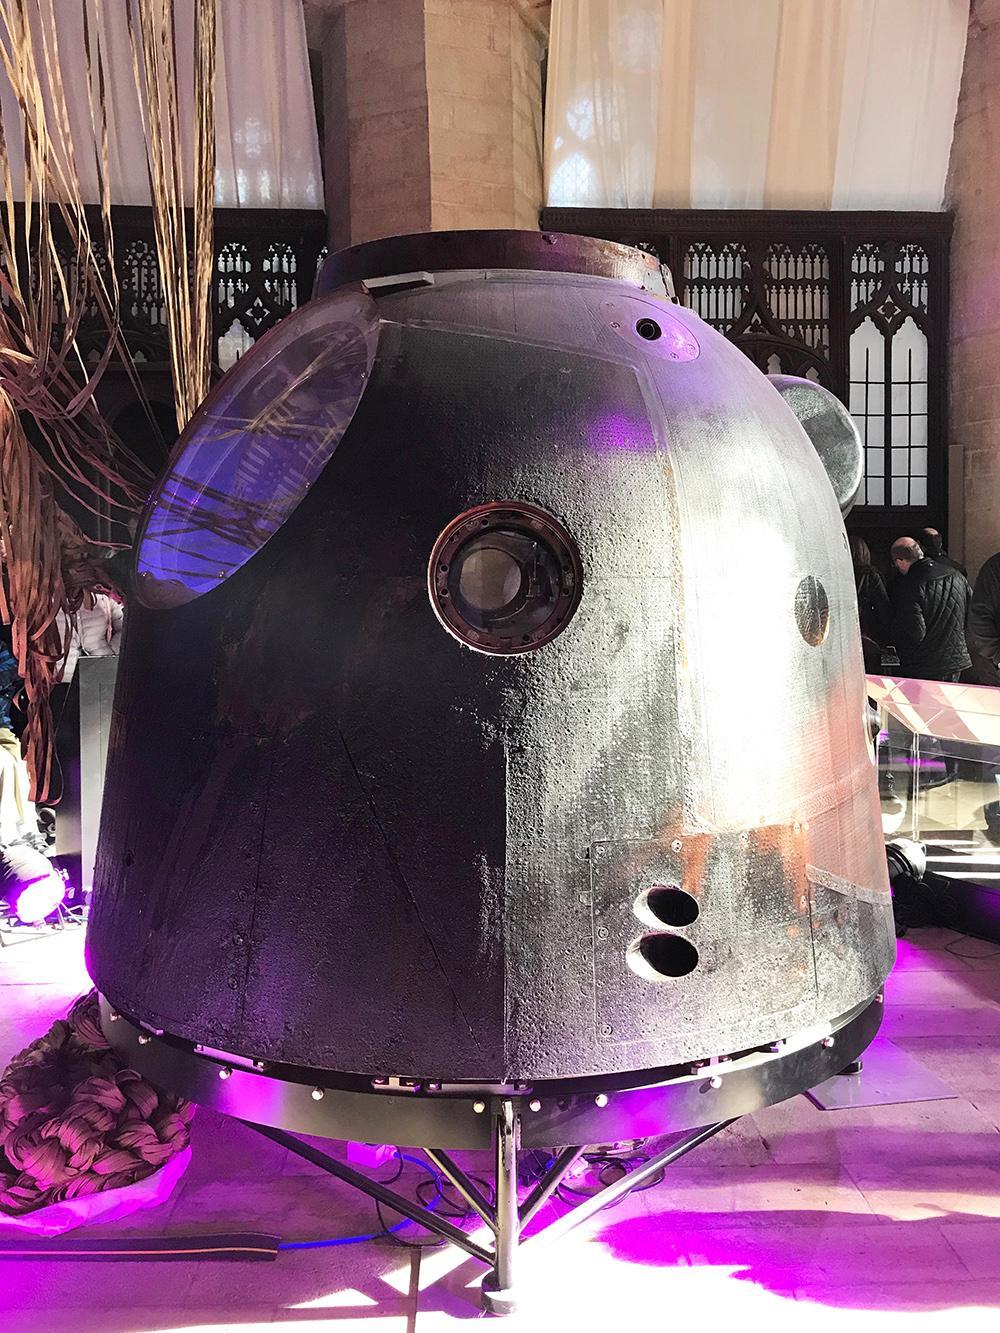 https://group.sciencemuseum.org.uk/project/tim-peakes-spacecraft-tour/